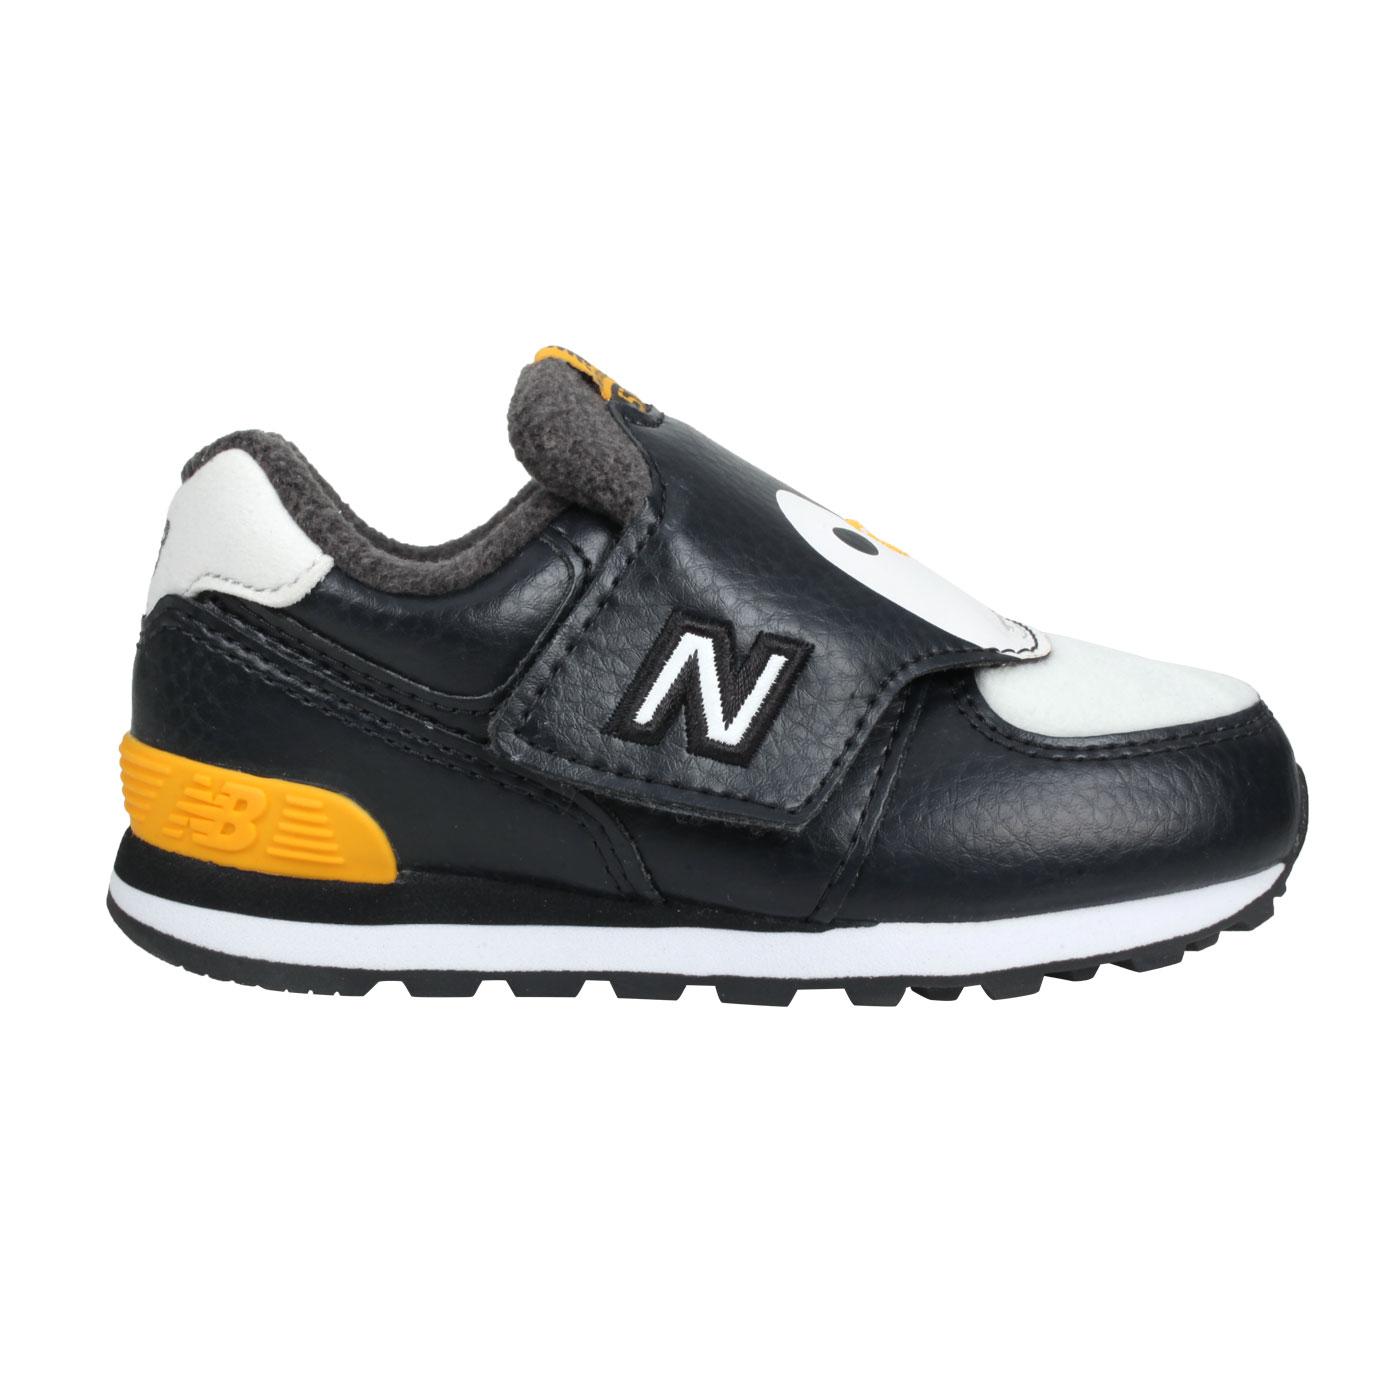 NEW BALANCE 小童休閒鞋 IV574AQP